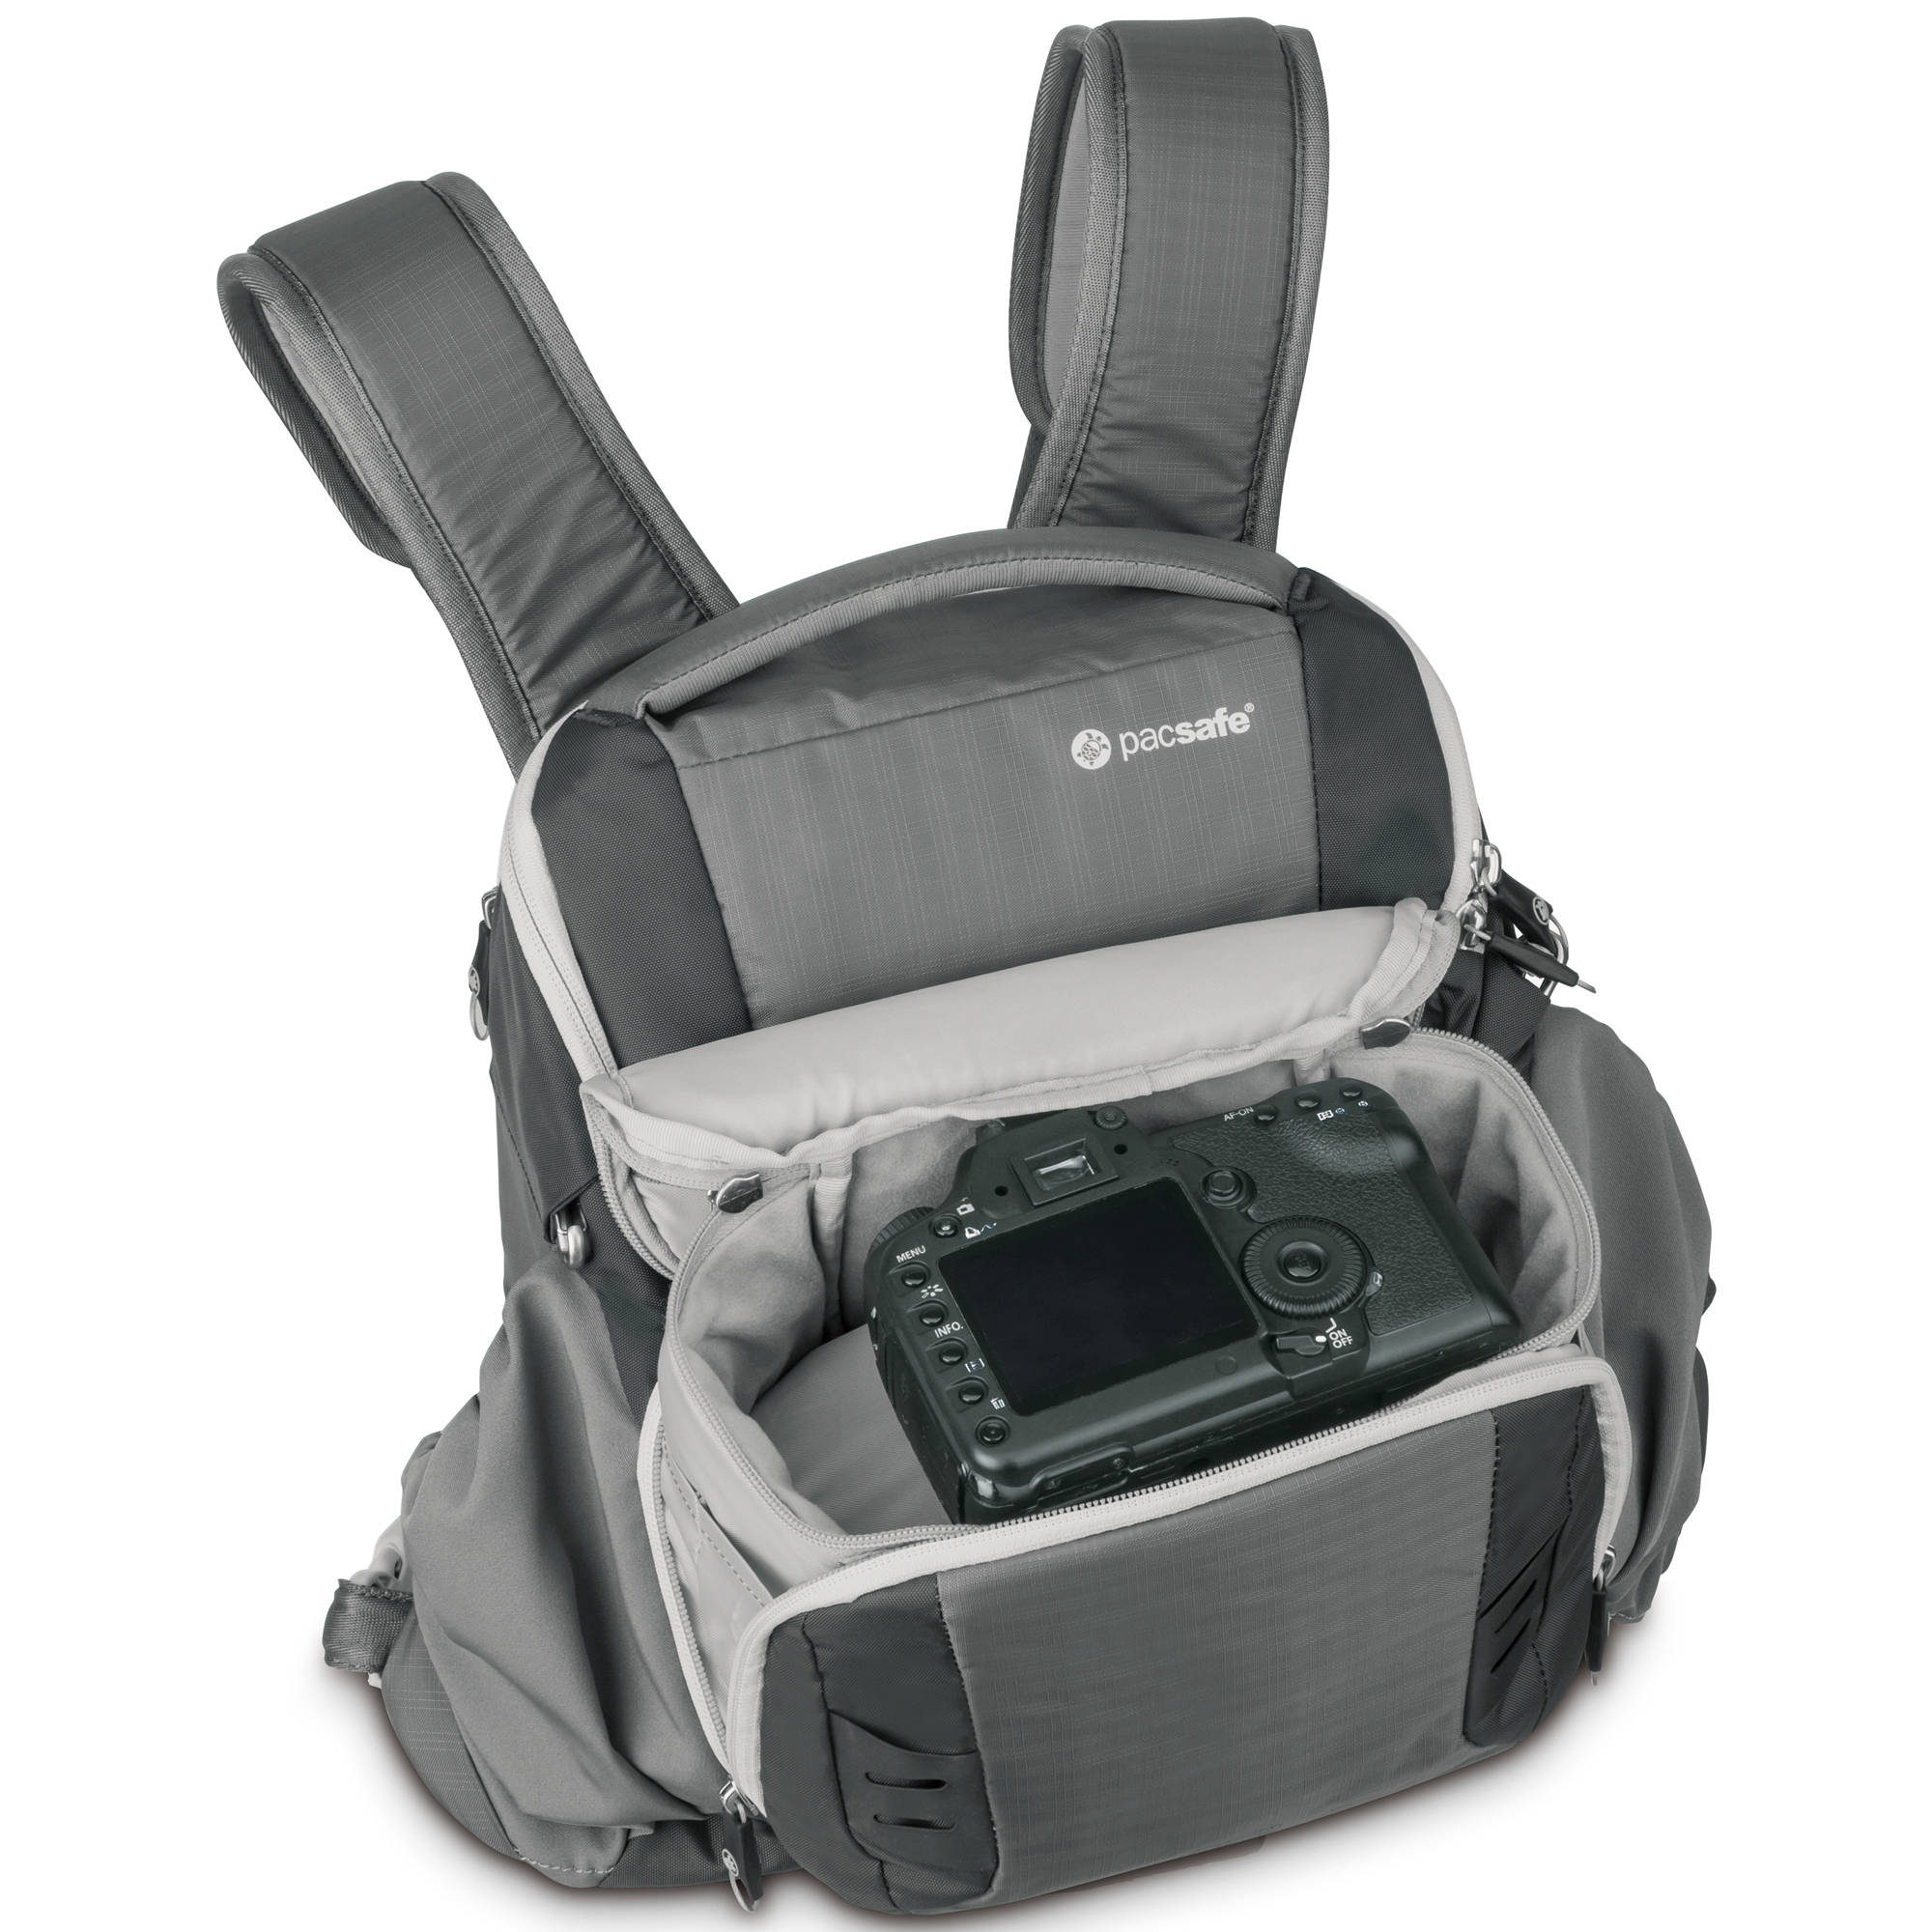 Pacsafe Camsafe V11 Anti-Theft Camera Front Pack (Storm Gray)